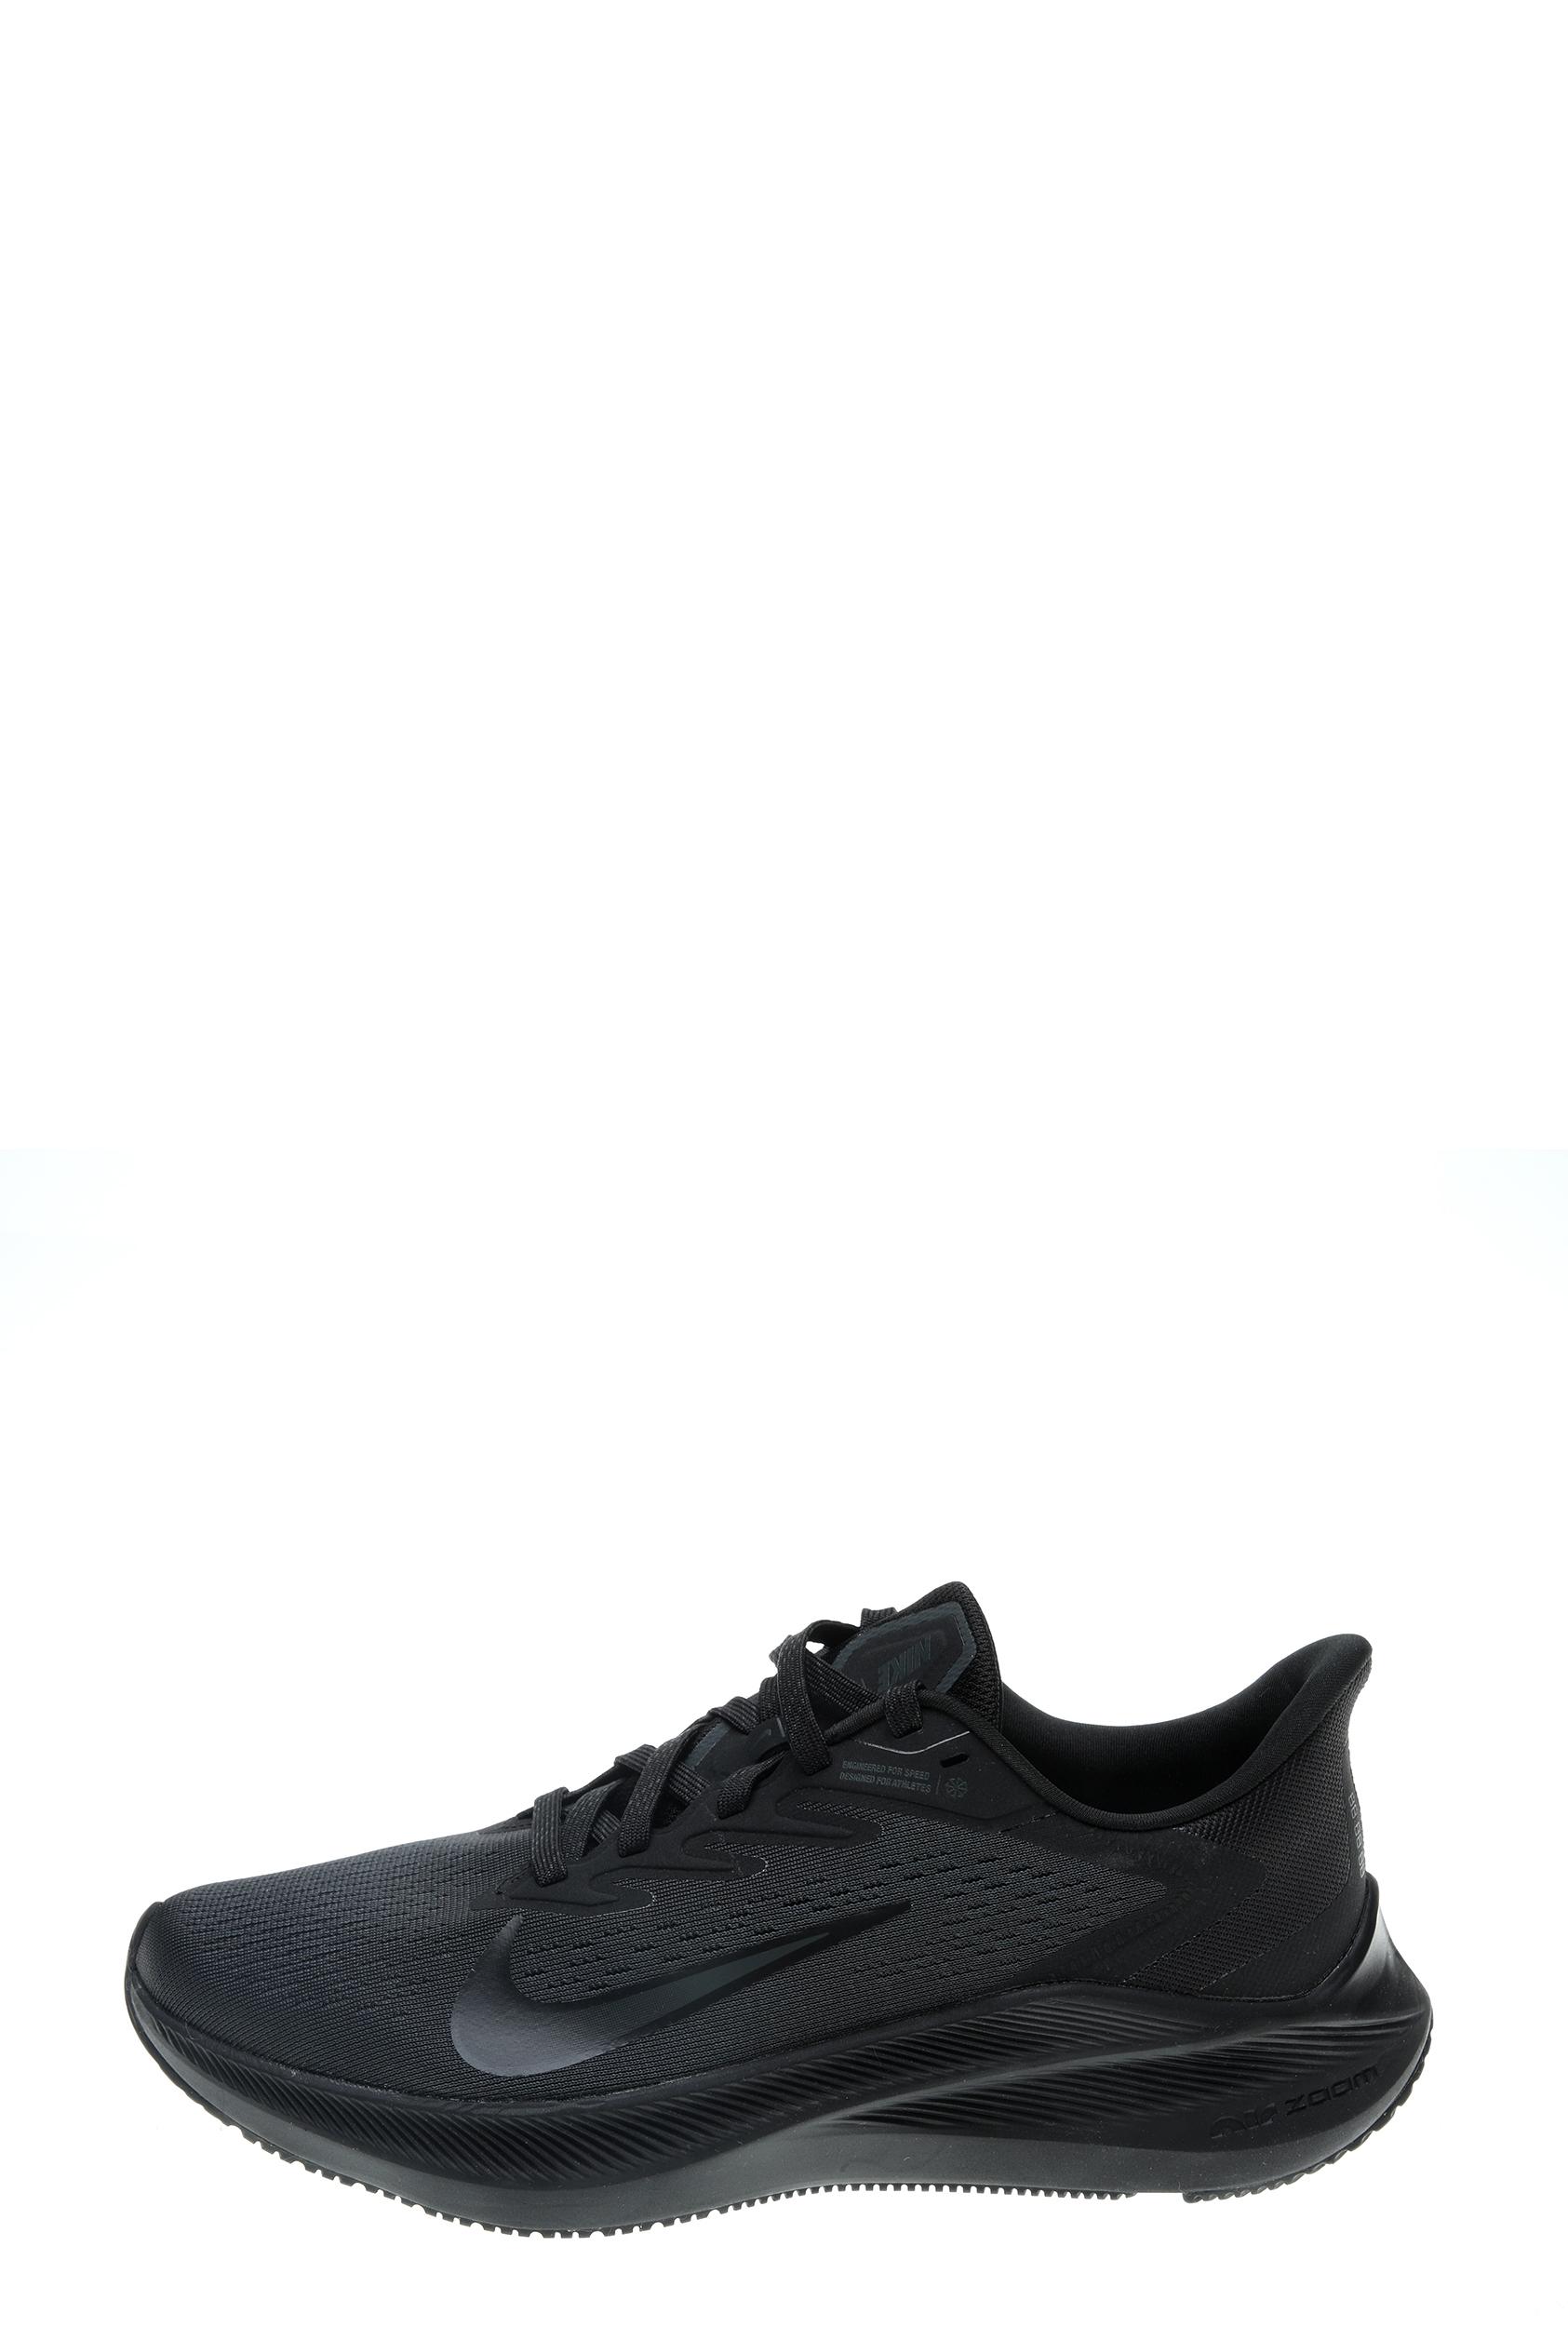 NIKE – Γυναικείο παπούτσι για τρέξιμο NIKE ZOOM WINFLO 7 μαύρο